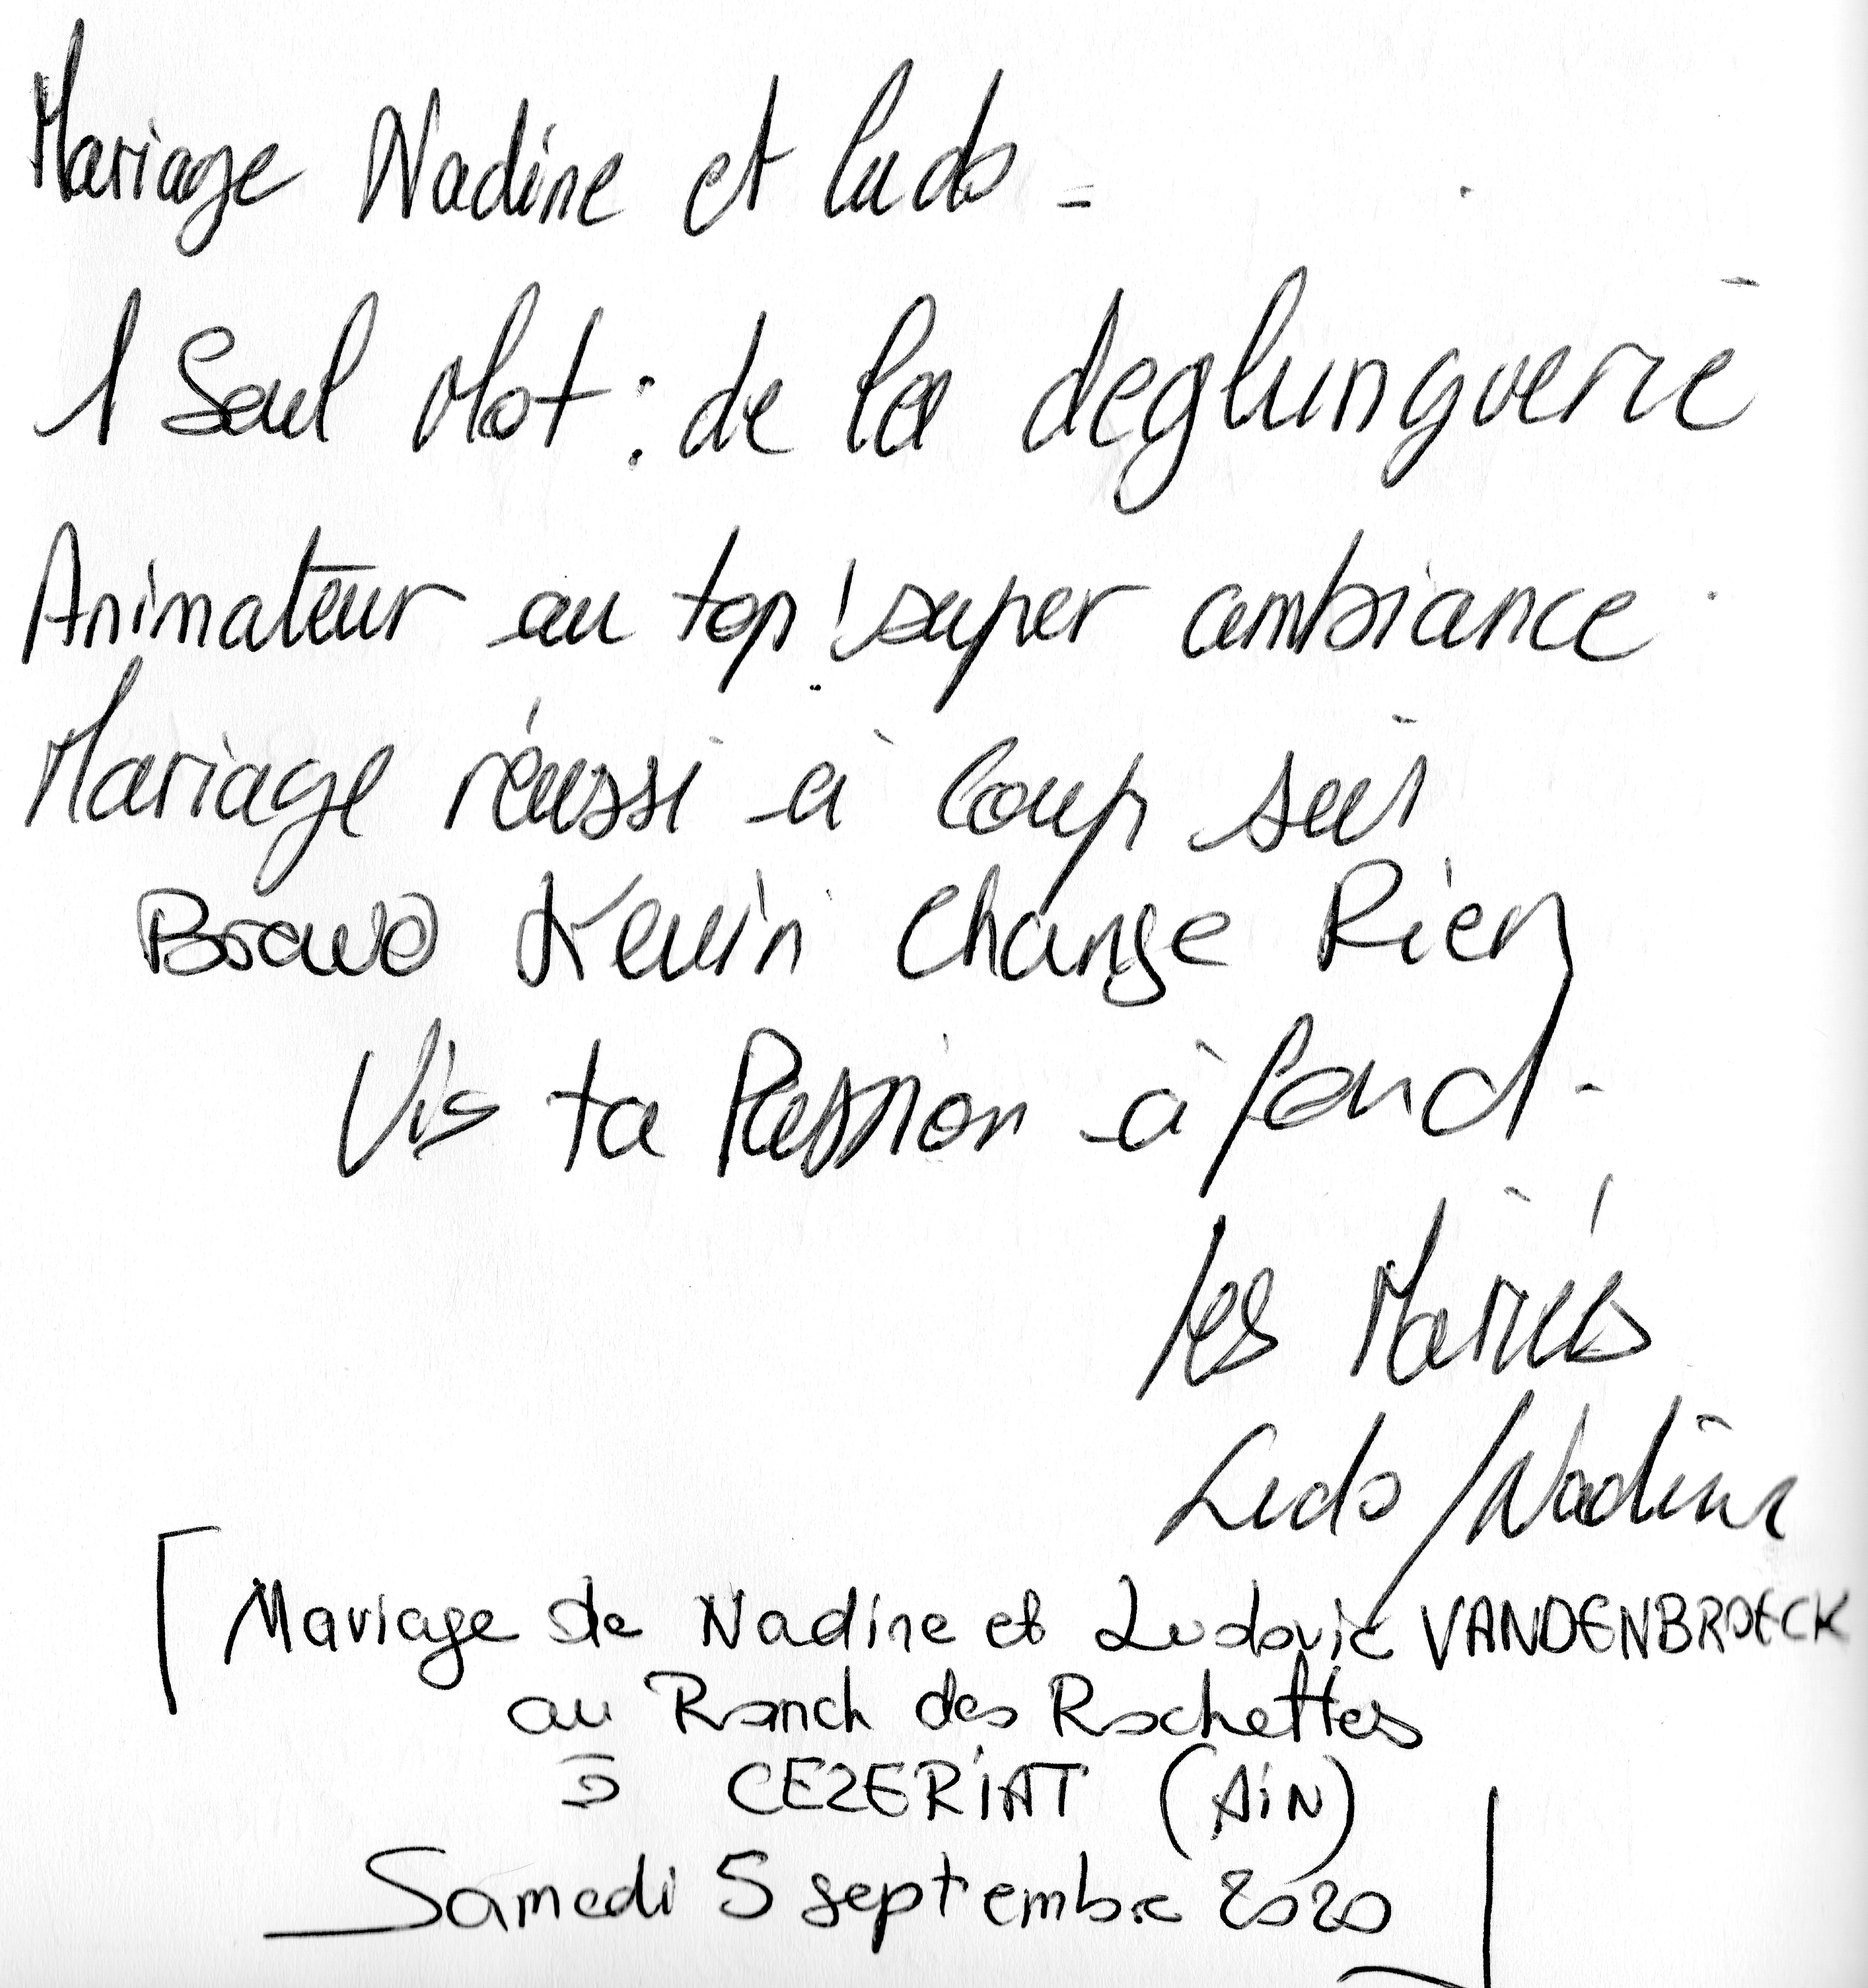 Mariage de Nadine & Ludovic VANDENBROECK